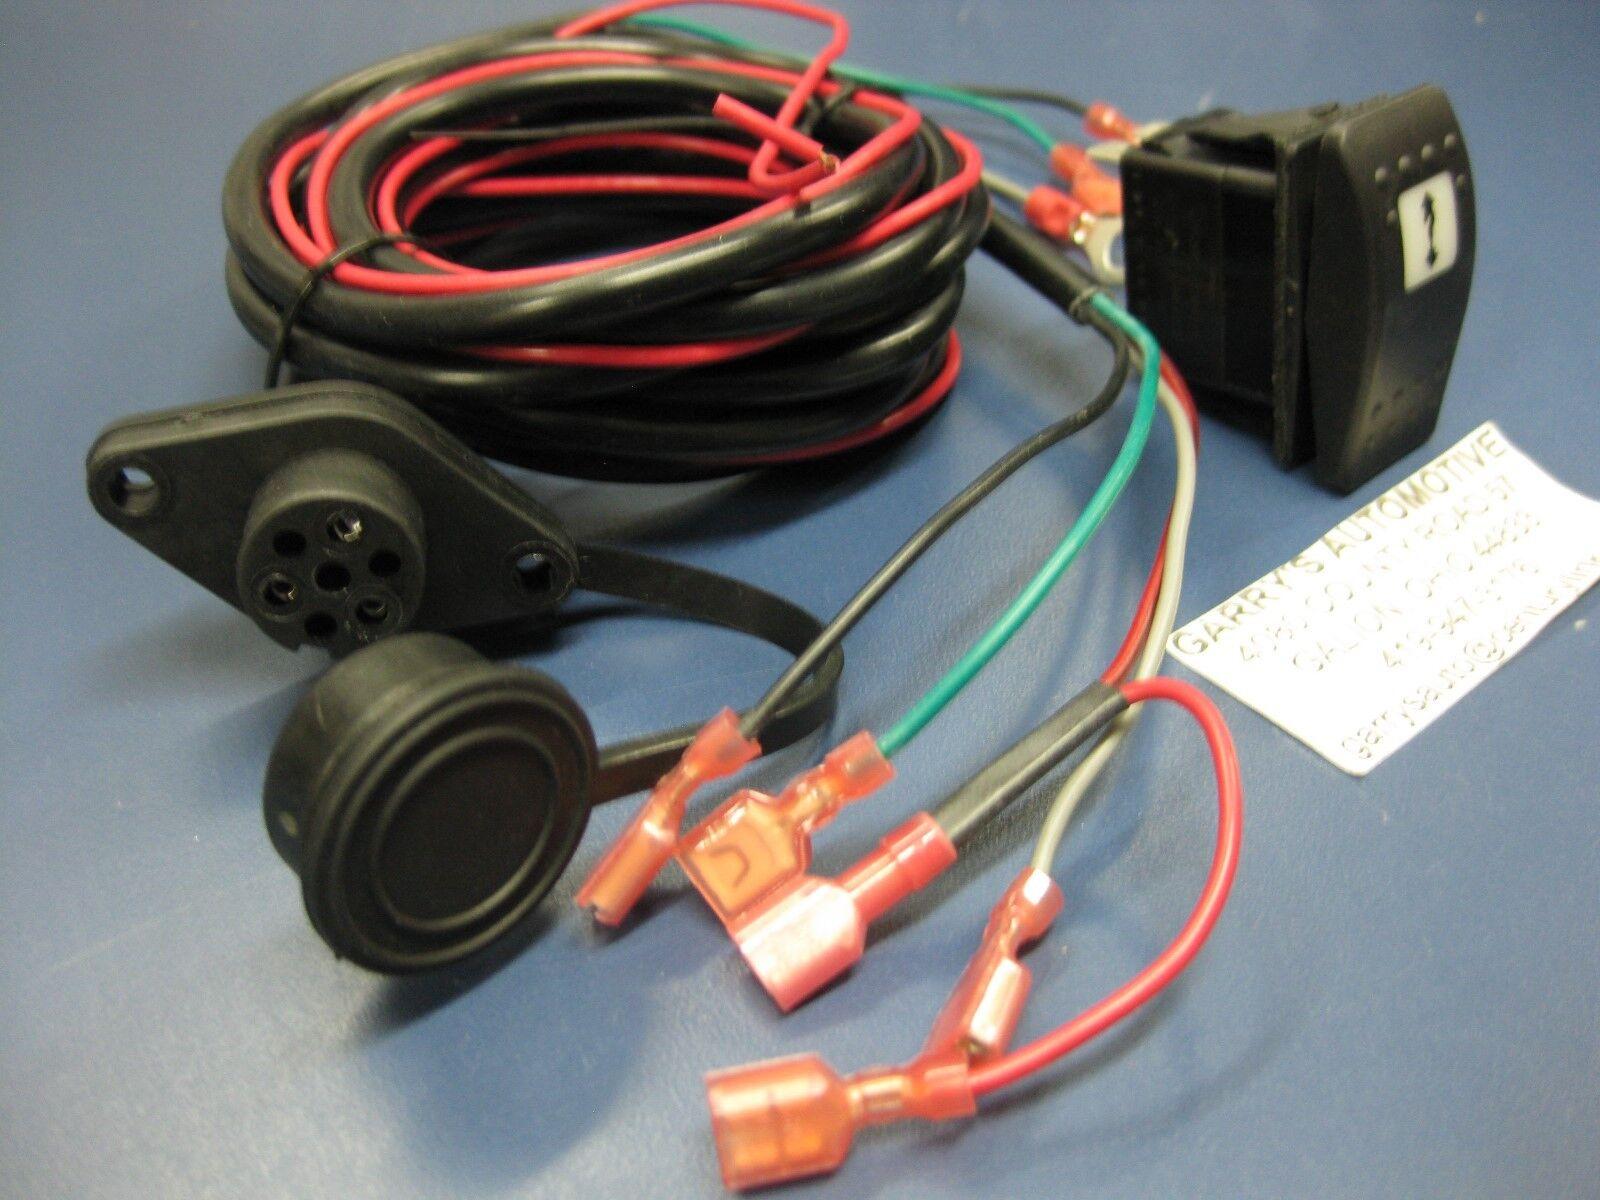 Warn 99897 Dash Rocker Switch Kit Incl Illuminated Switch To Operate Winch Wiri